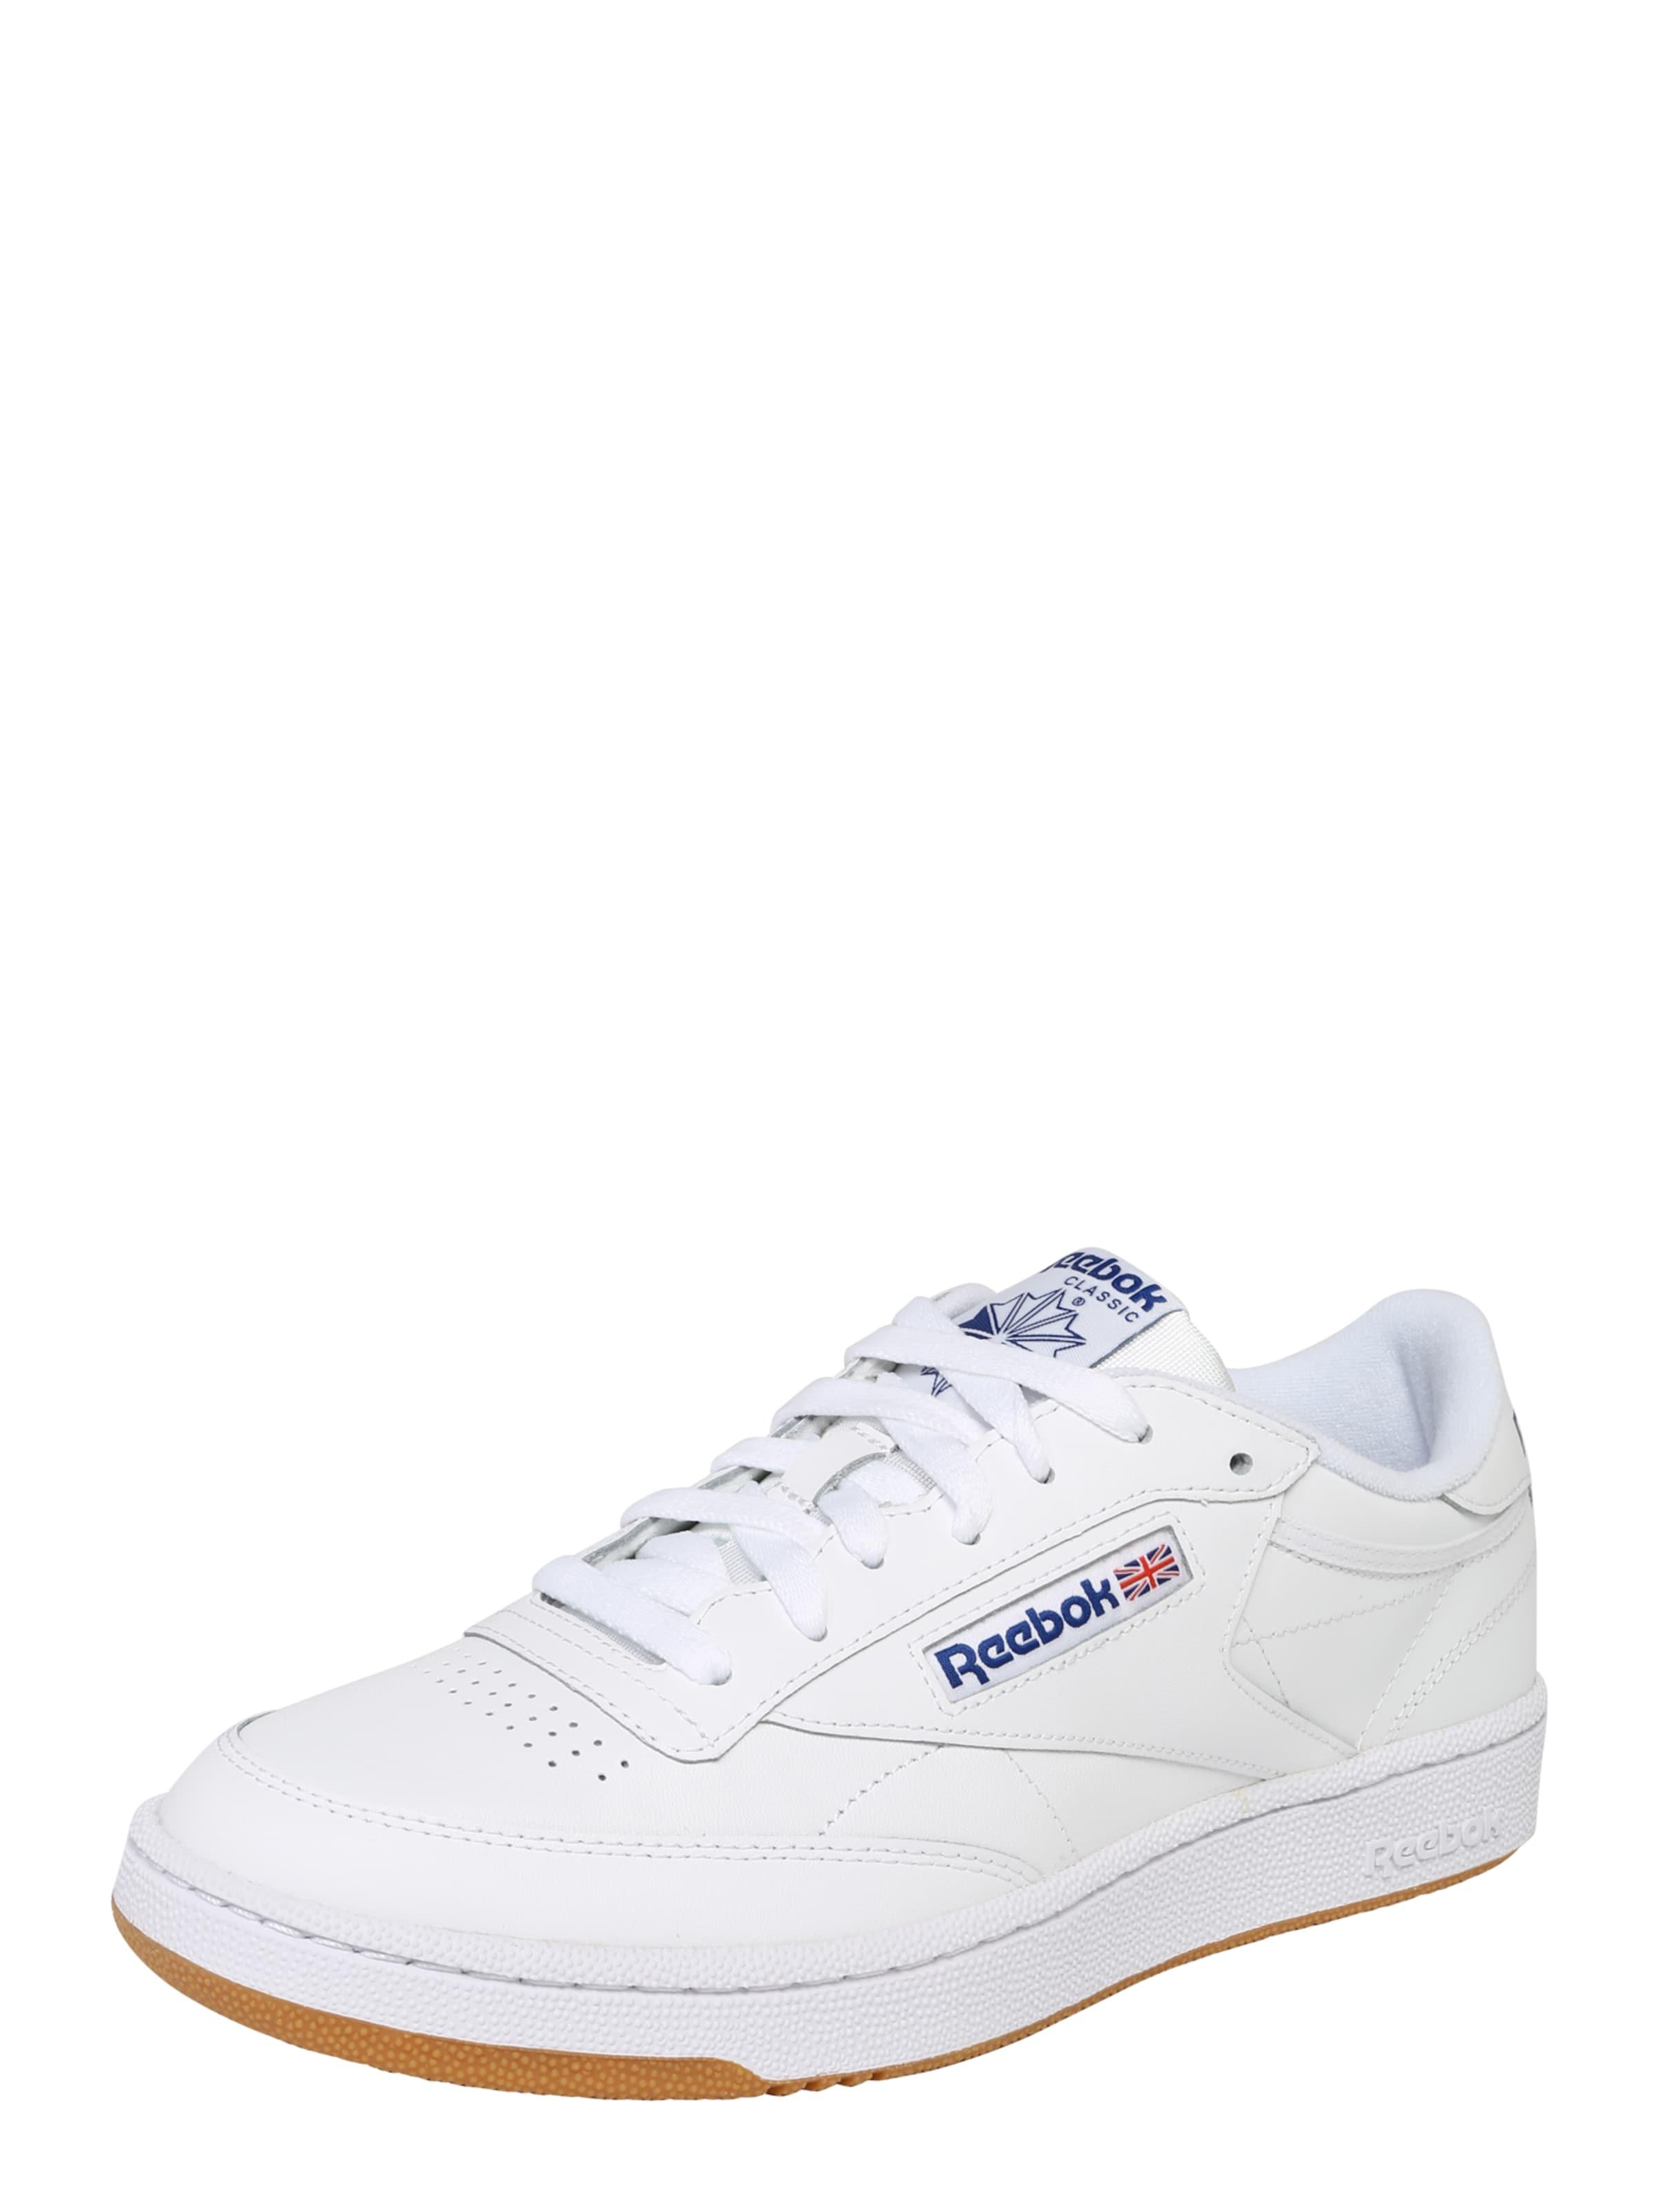 Sneaker Classic BlauRot Reebok Weiß In pGqzUMSV